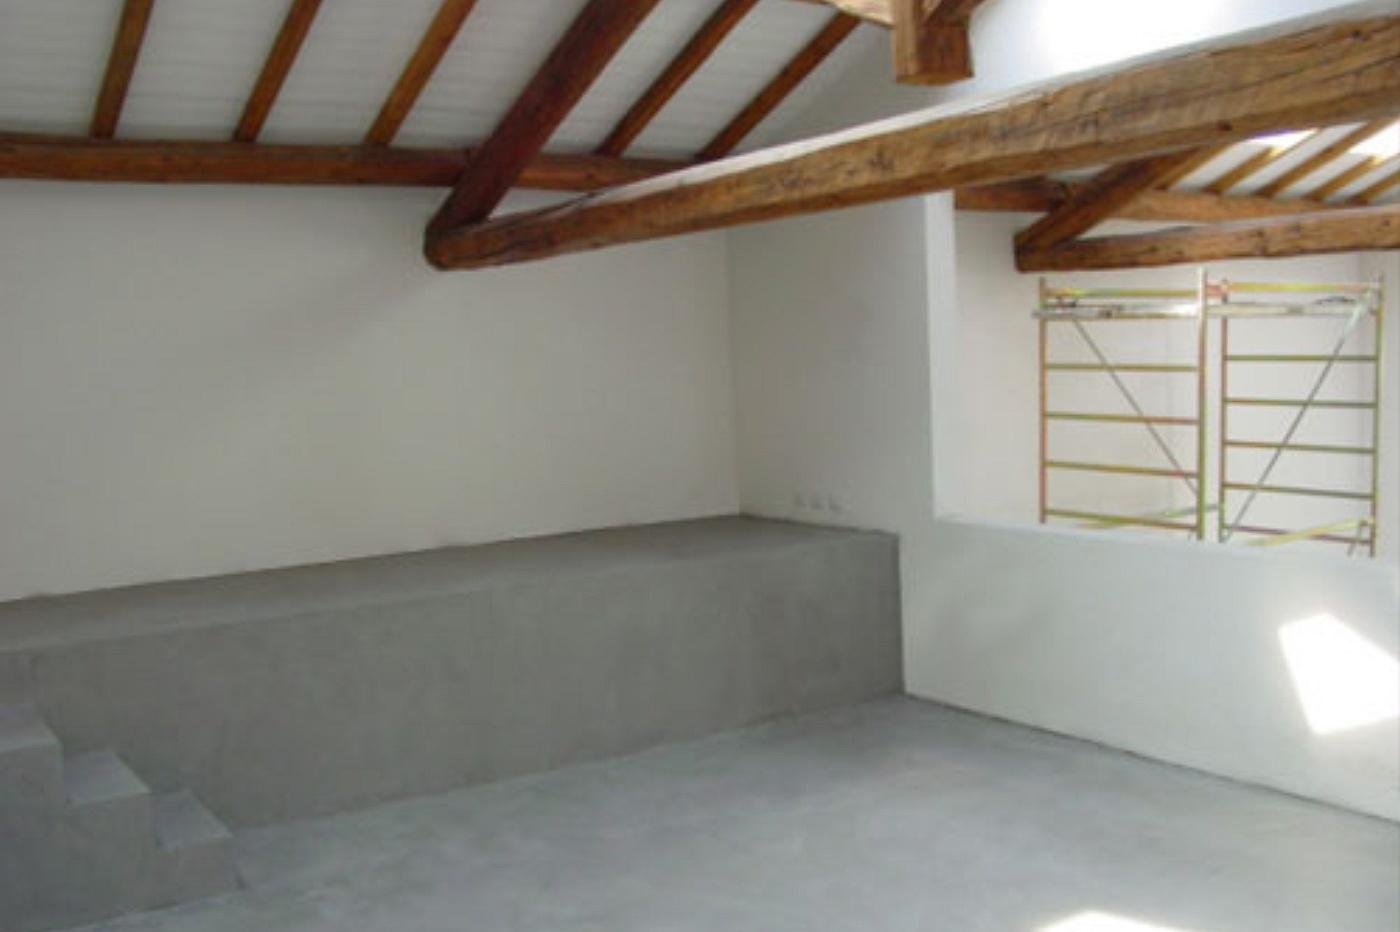 Casa moderna roma italy pavimento in cemento - Pavimenti per casa moderna ...